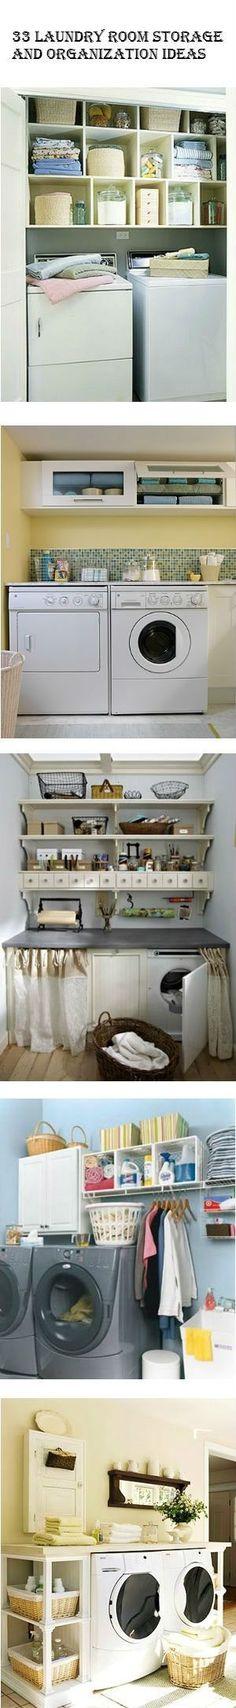 33 Laundry Room Storage and Organization Ideas | DIY Comfy Home by DIYNCraftz